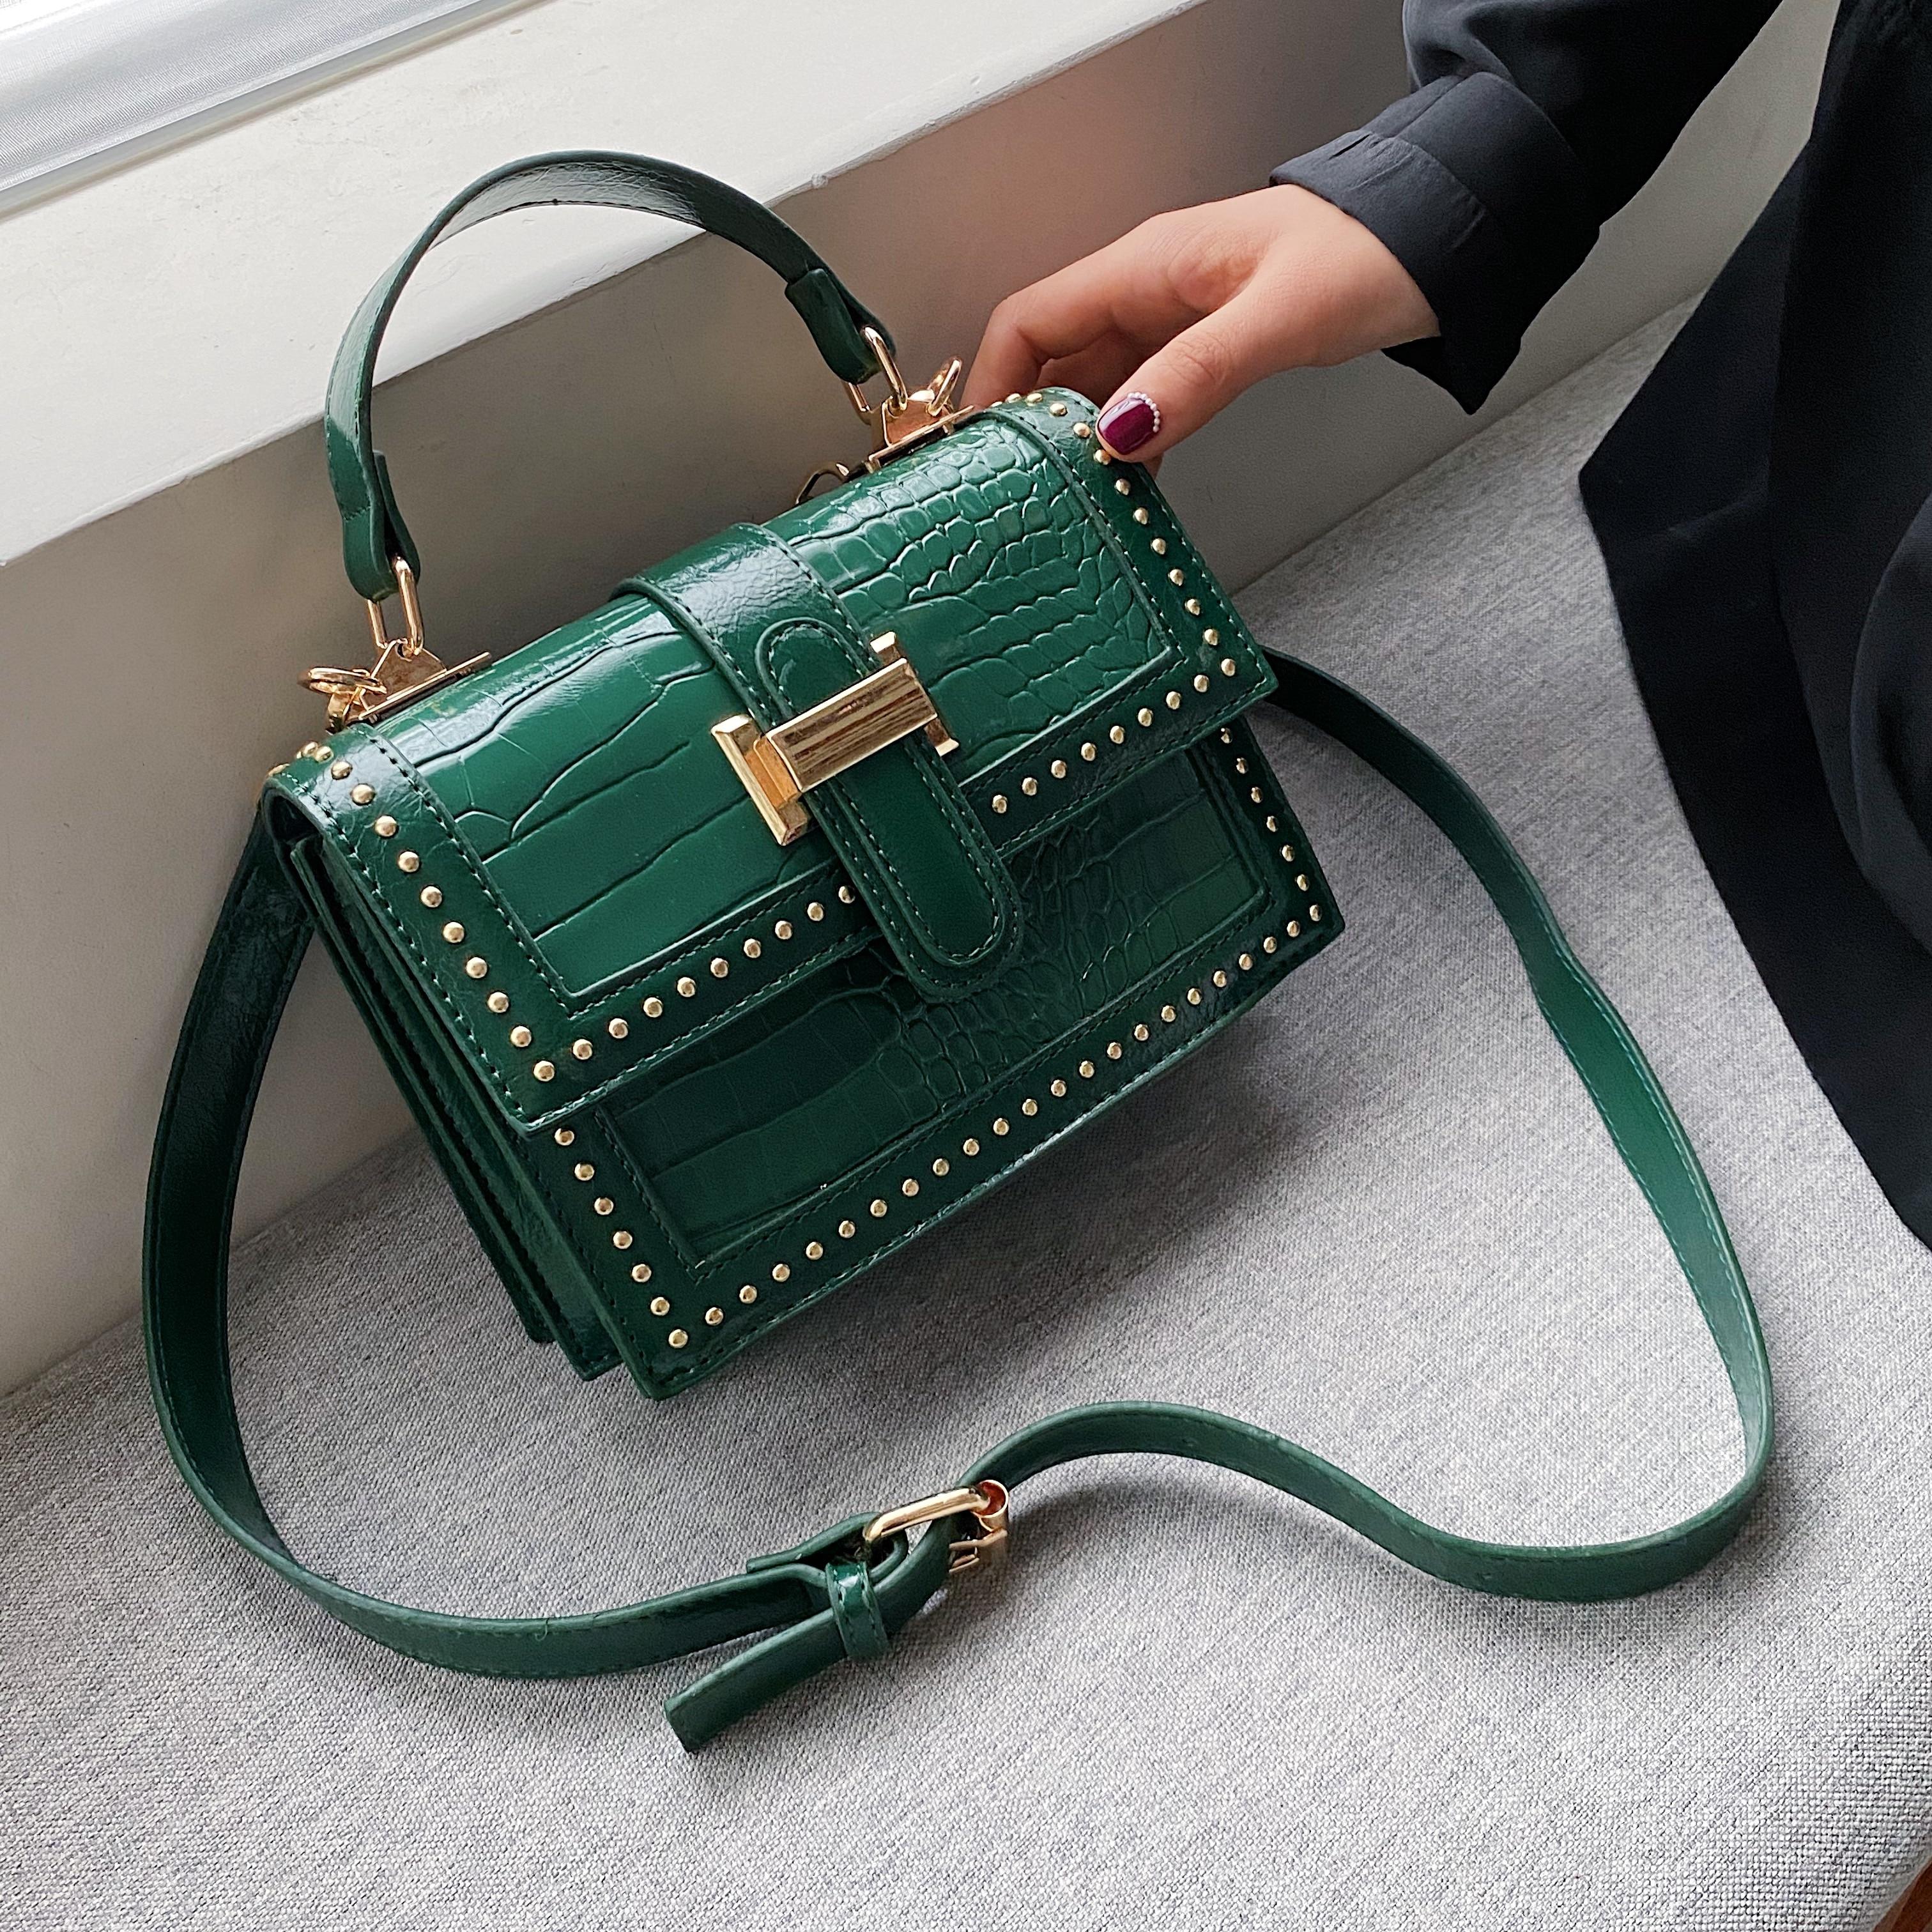 Green Rivets PU Leather Crossbody Bags For Women 2020 Fashion Brand Designer Luxury Handbag Shoulder Messenger Totes Bag Female